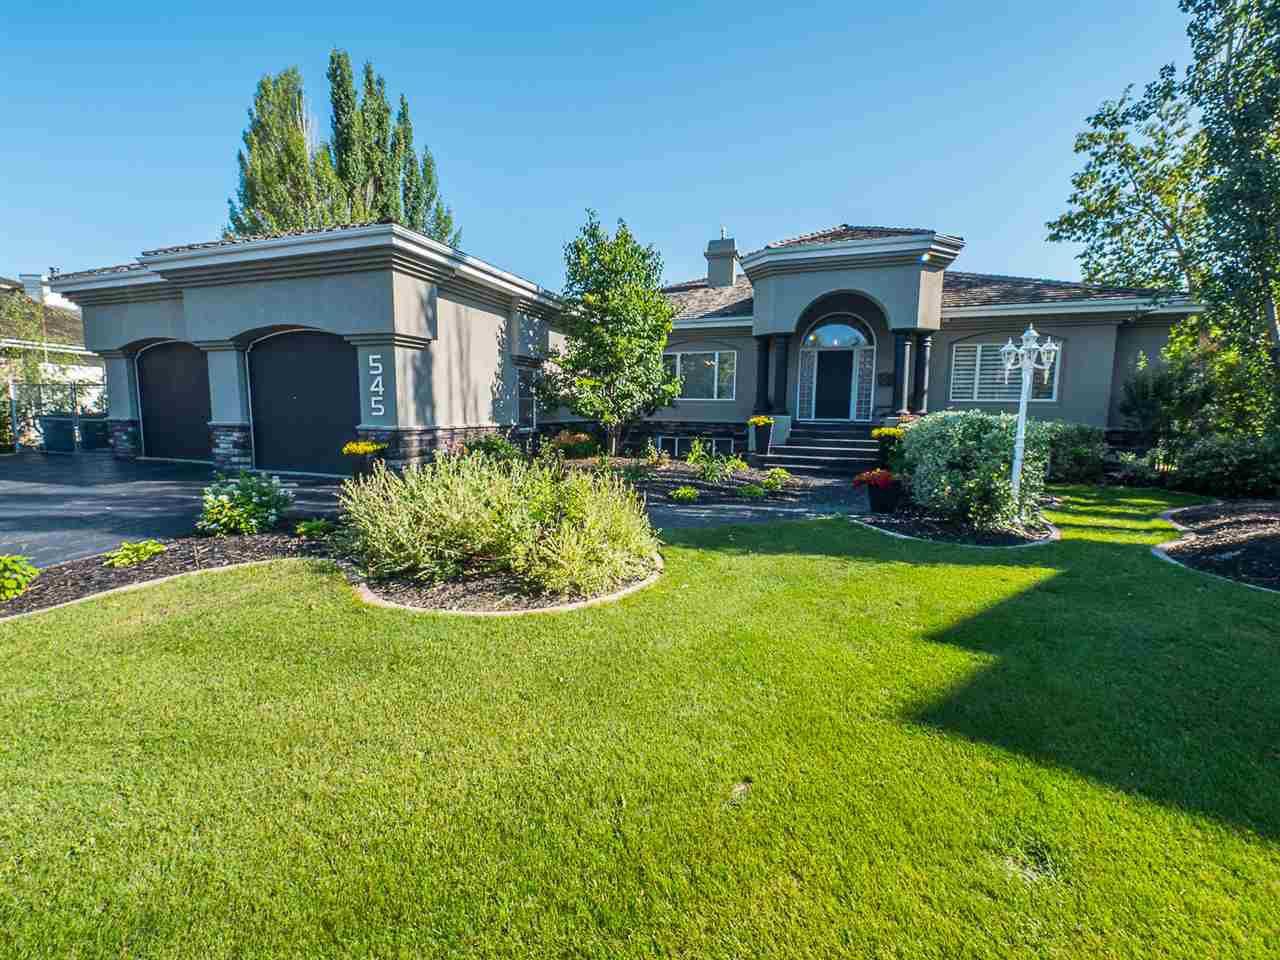 Main Photo: 545 ESTATE Drive: Sherwood Park House for sale : MLS®# E4135214